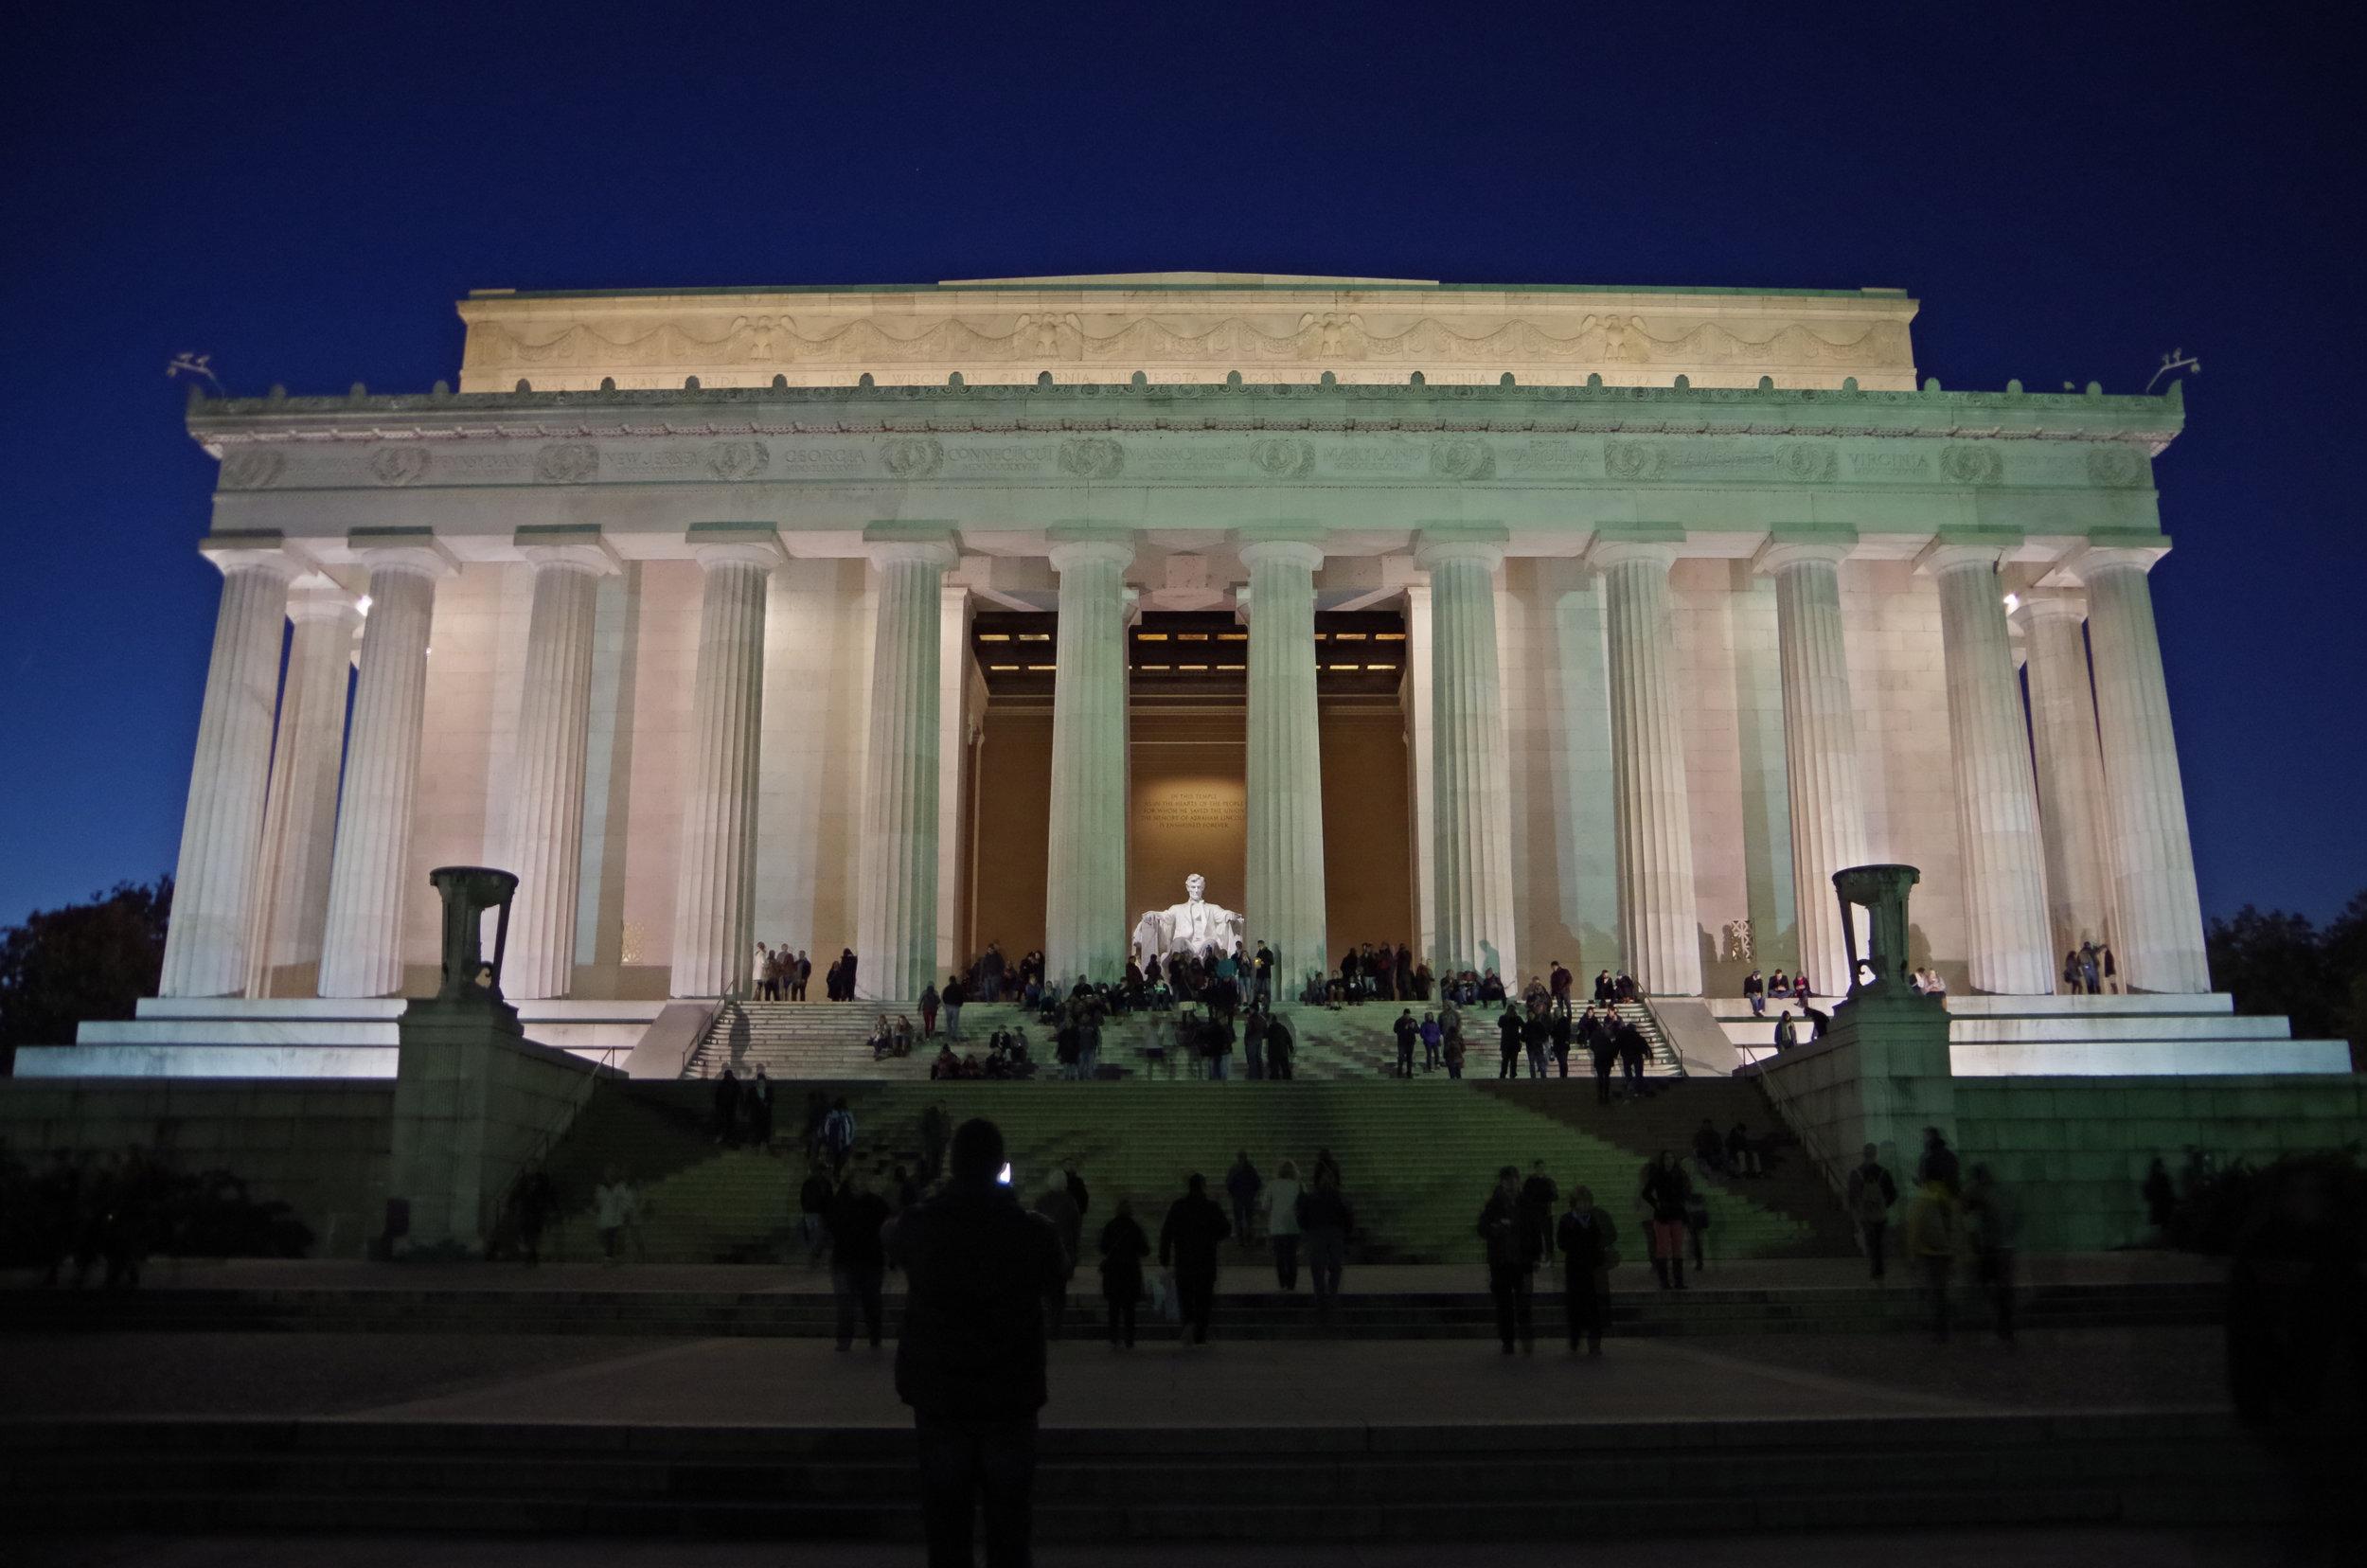 November 22, 2014 in Washington, DC